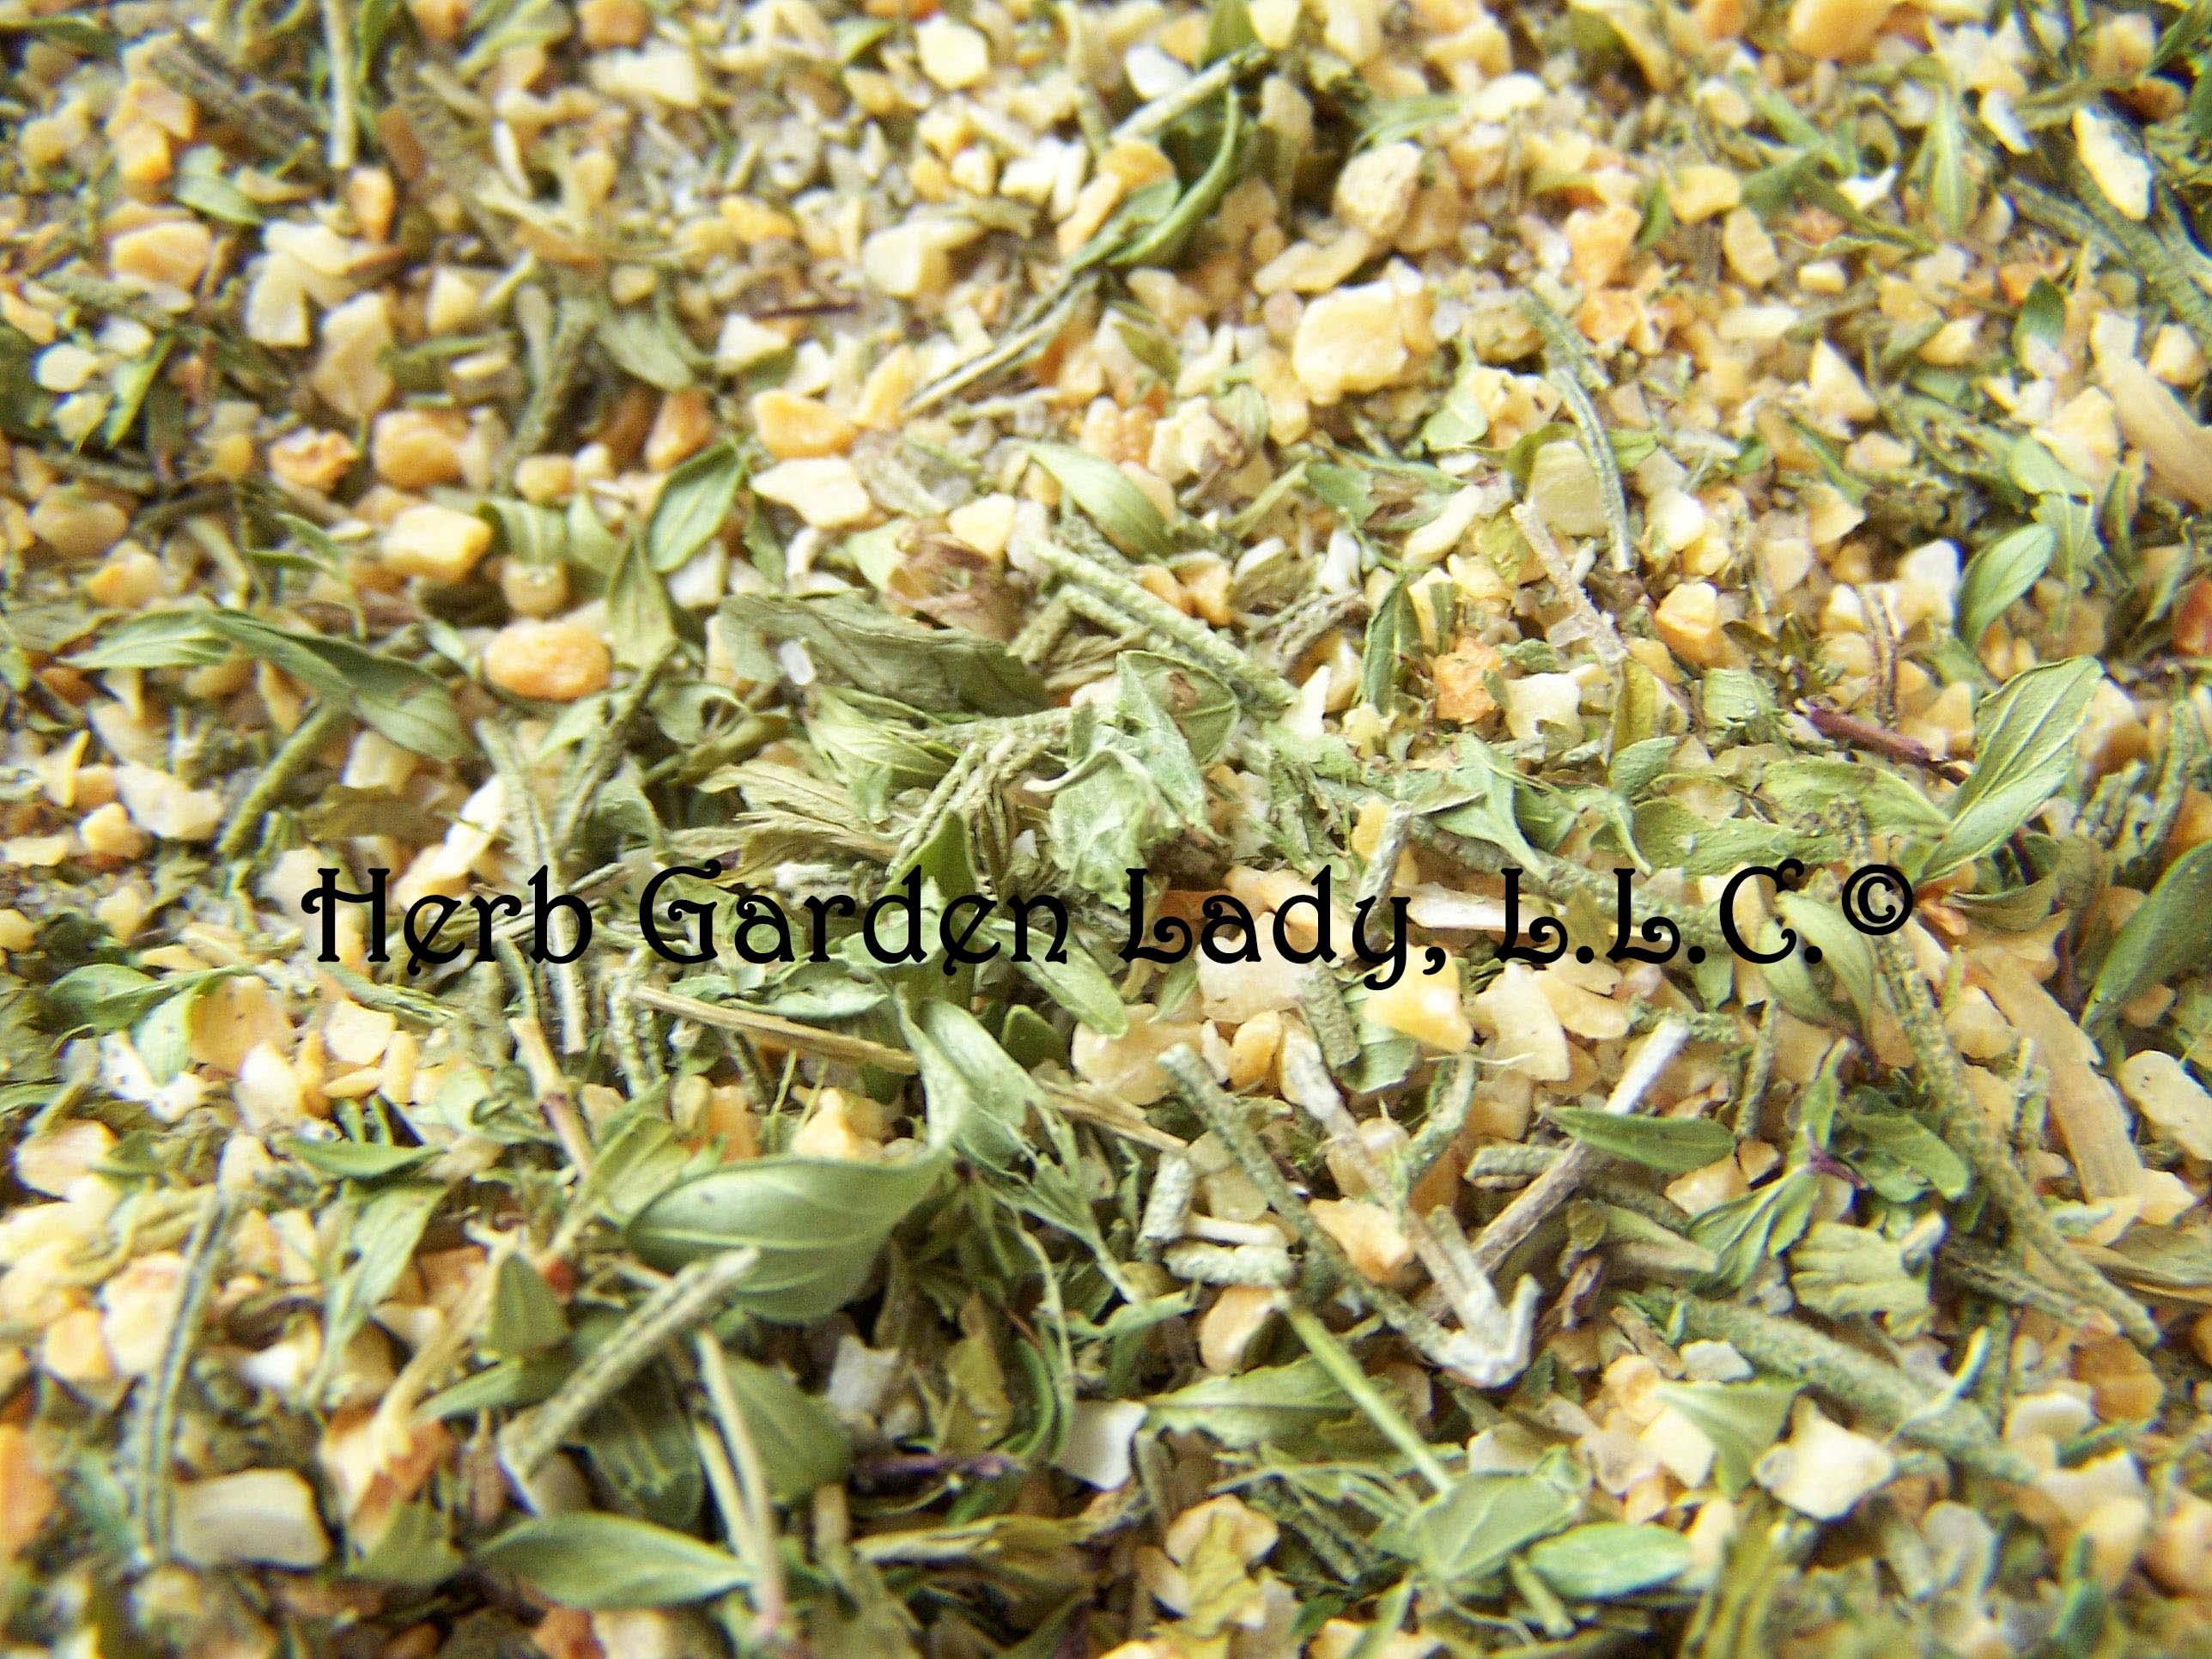 Savory herb rub using garlic, thyme, sea salt, rosemary and freshly ground pepper.